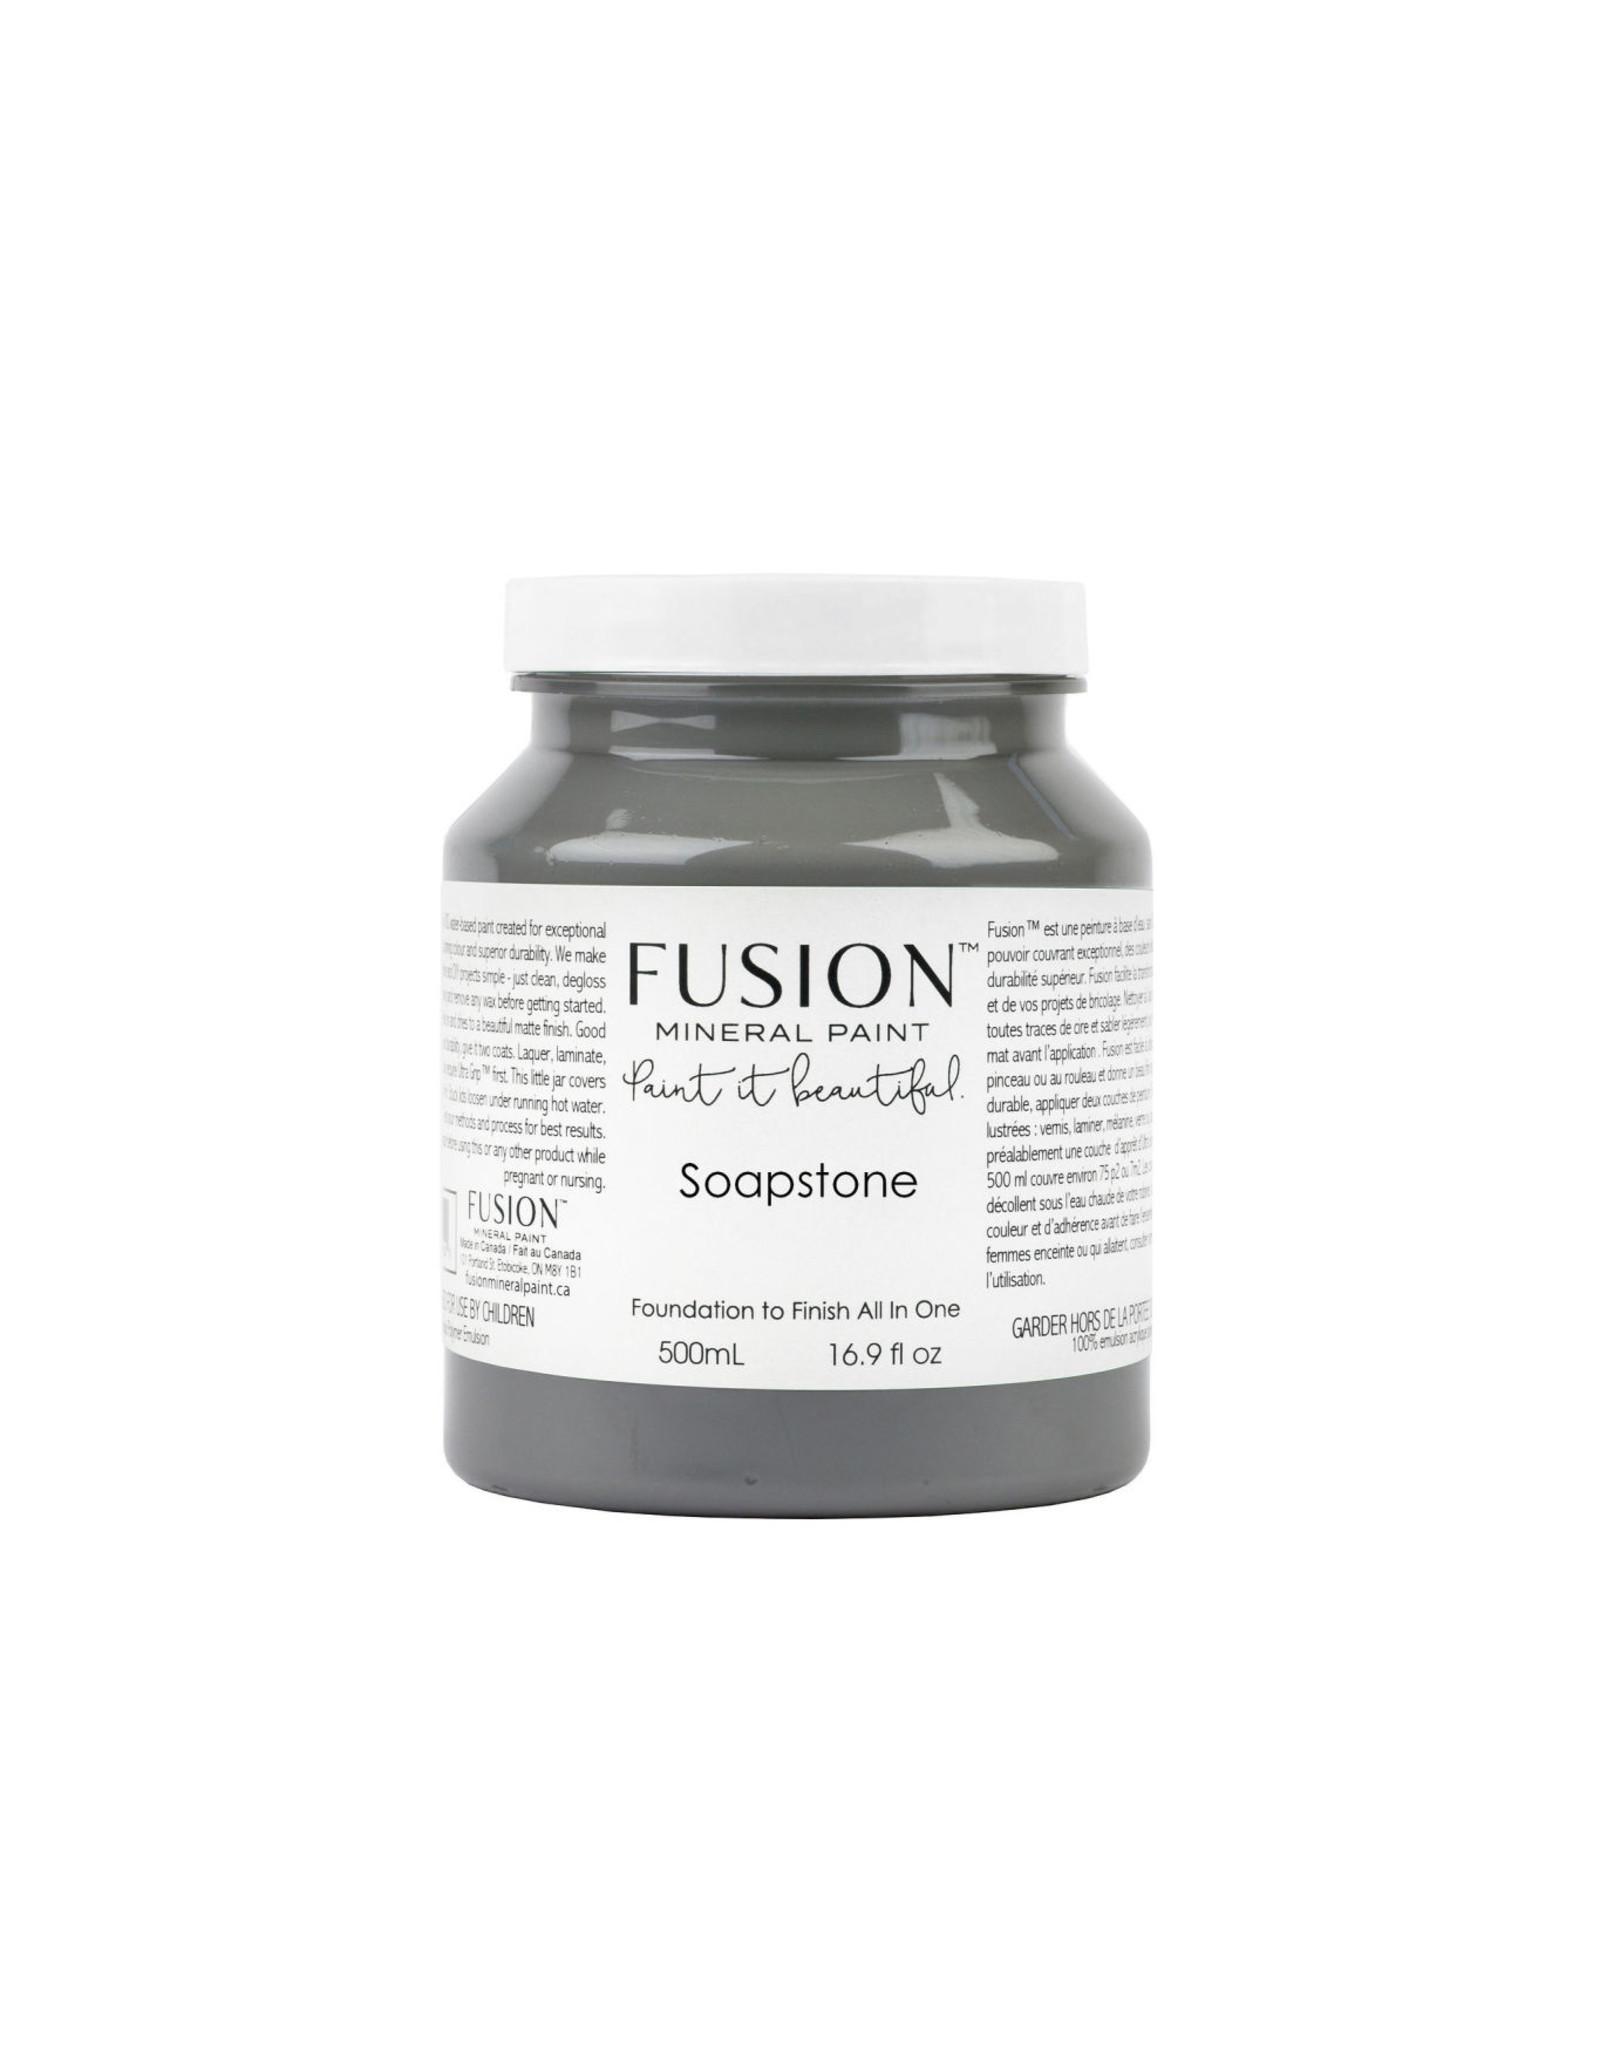 Fusion Mineral Paint Fusion Mineral Paint - Soapstone 500ml